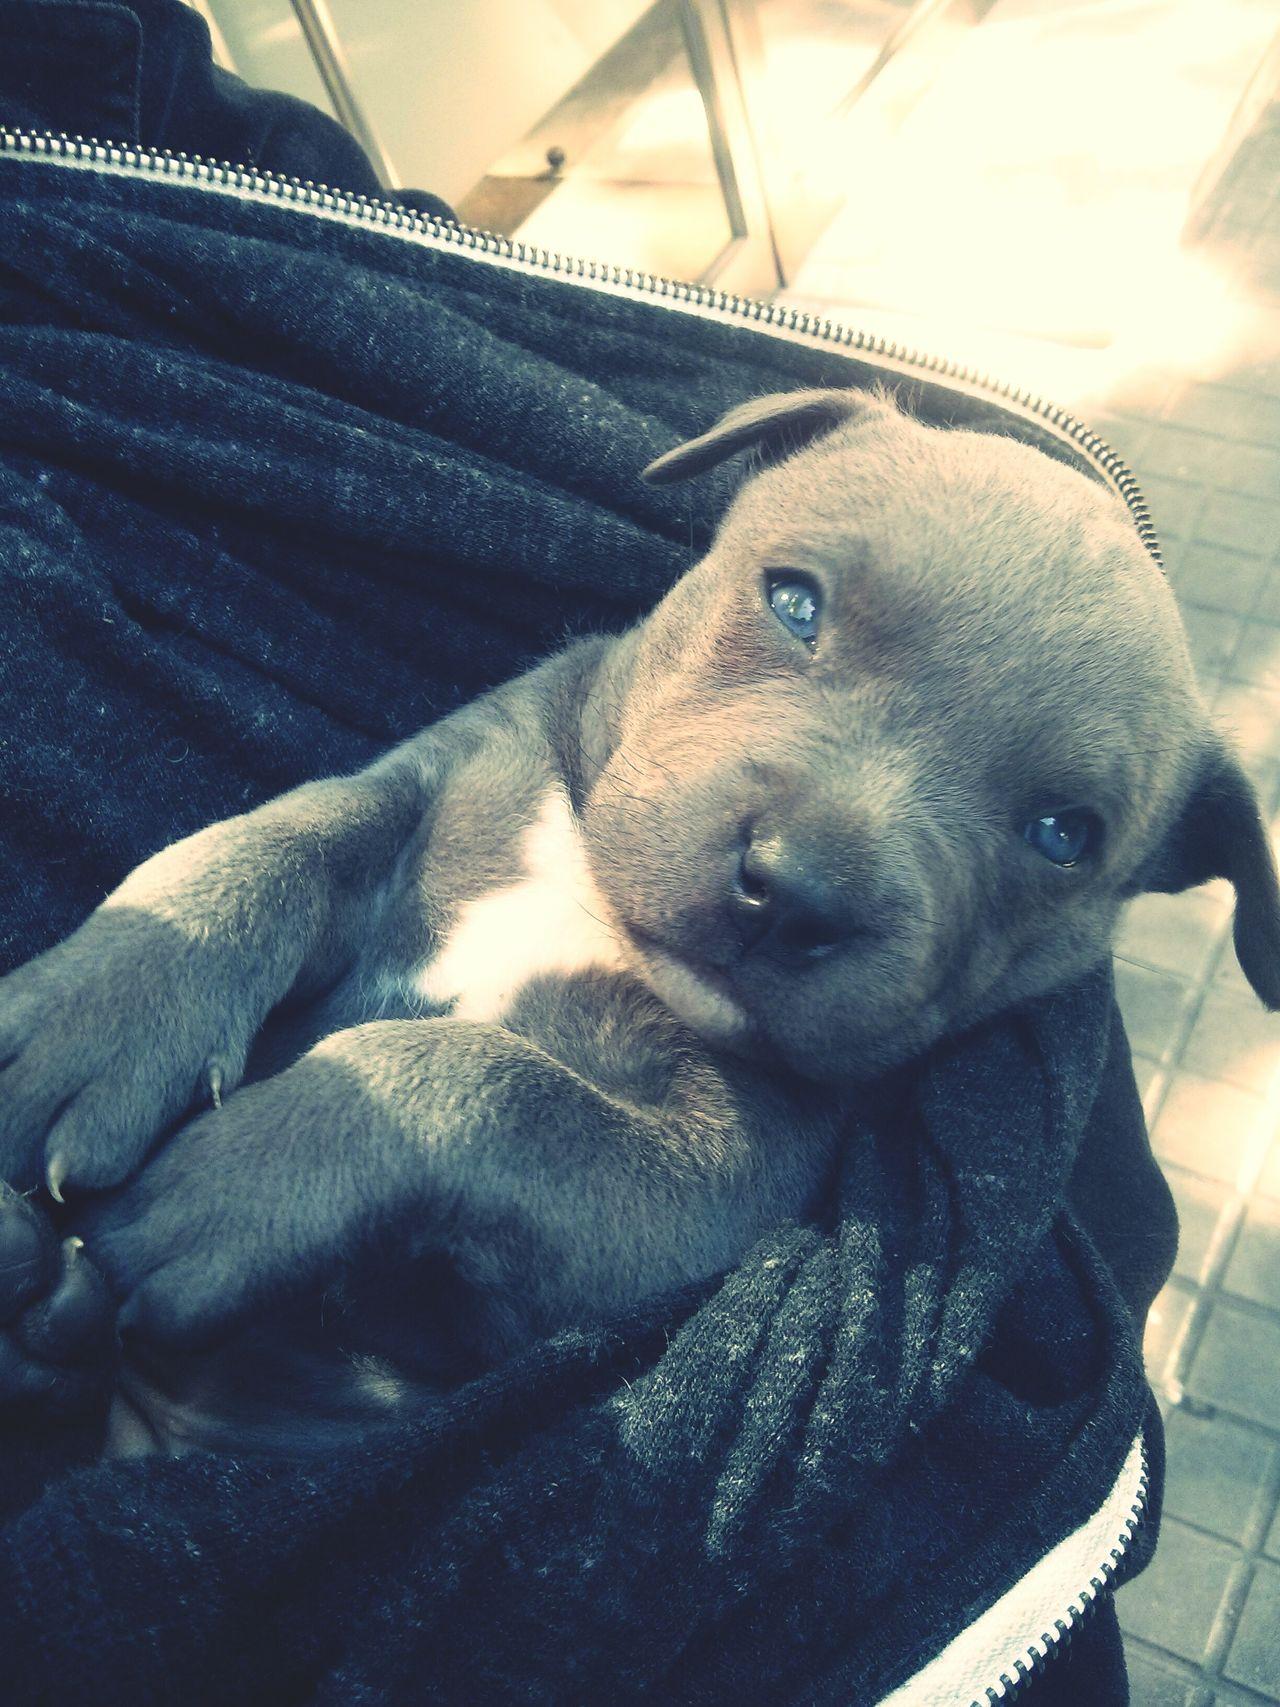 Fierce Pitbull Animals Dogs Pitbull Terrible I Love Dogs